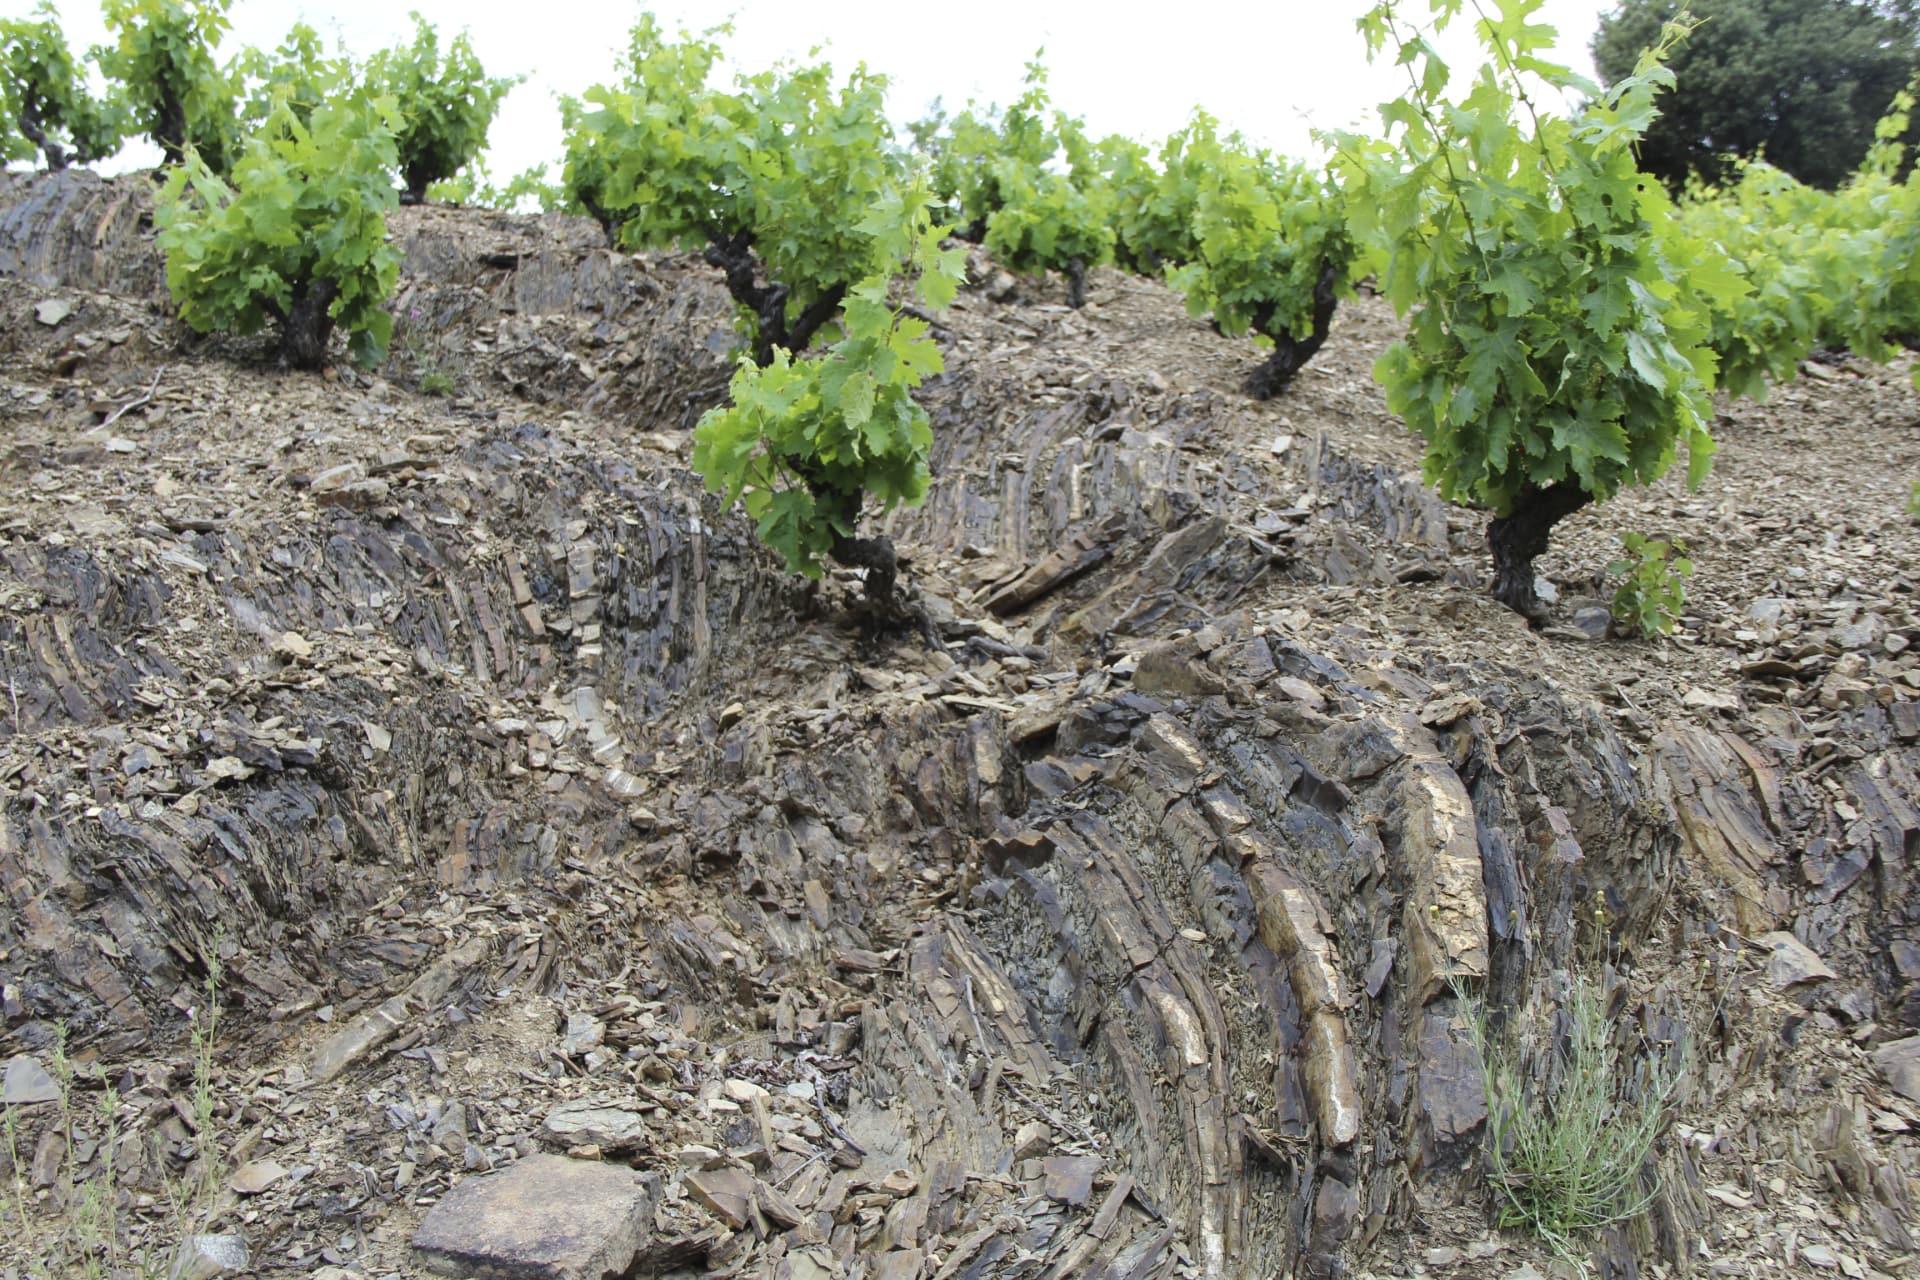 Grenache Fall Wine - Priorat, Spain